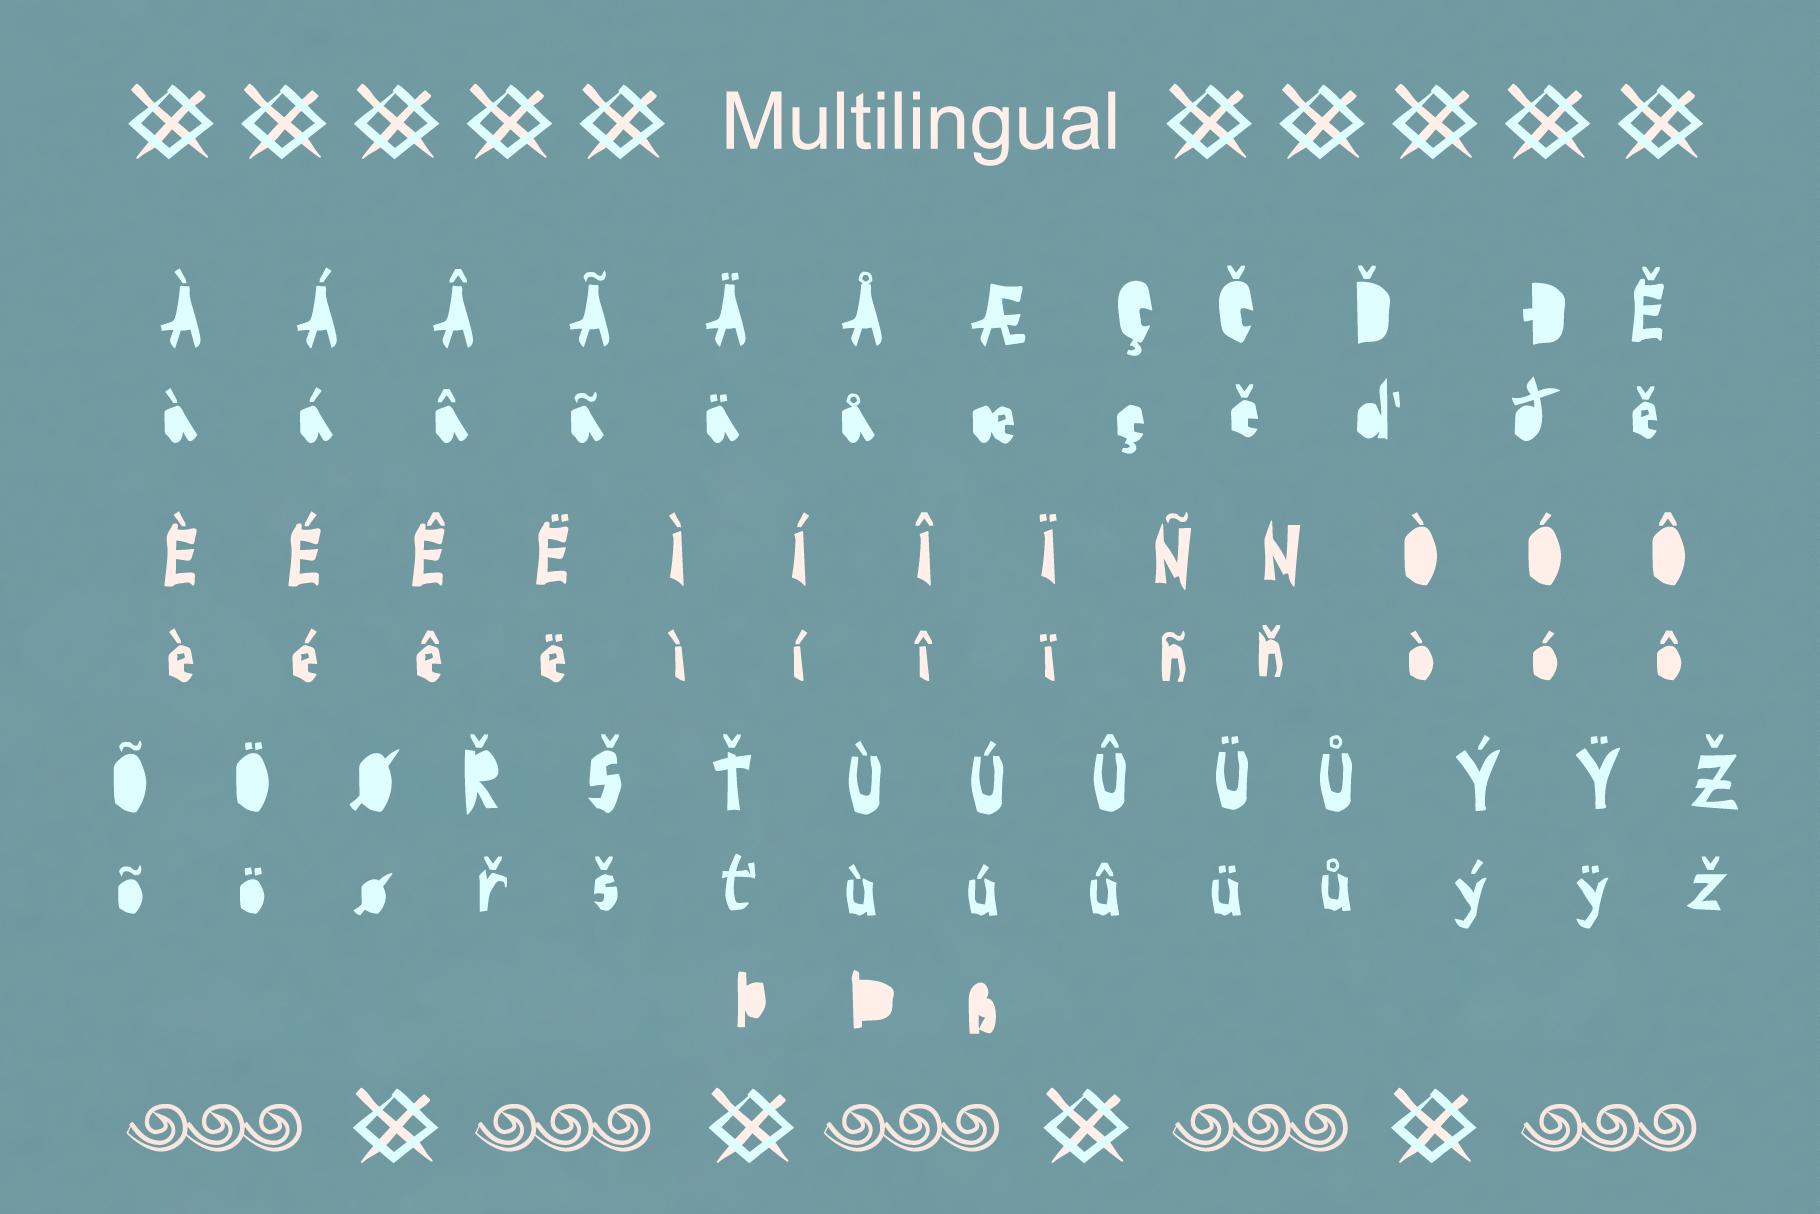 BRAVE-VIKING OTF font example image 3